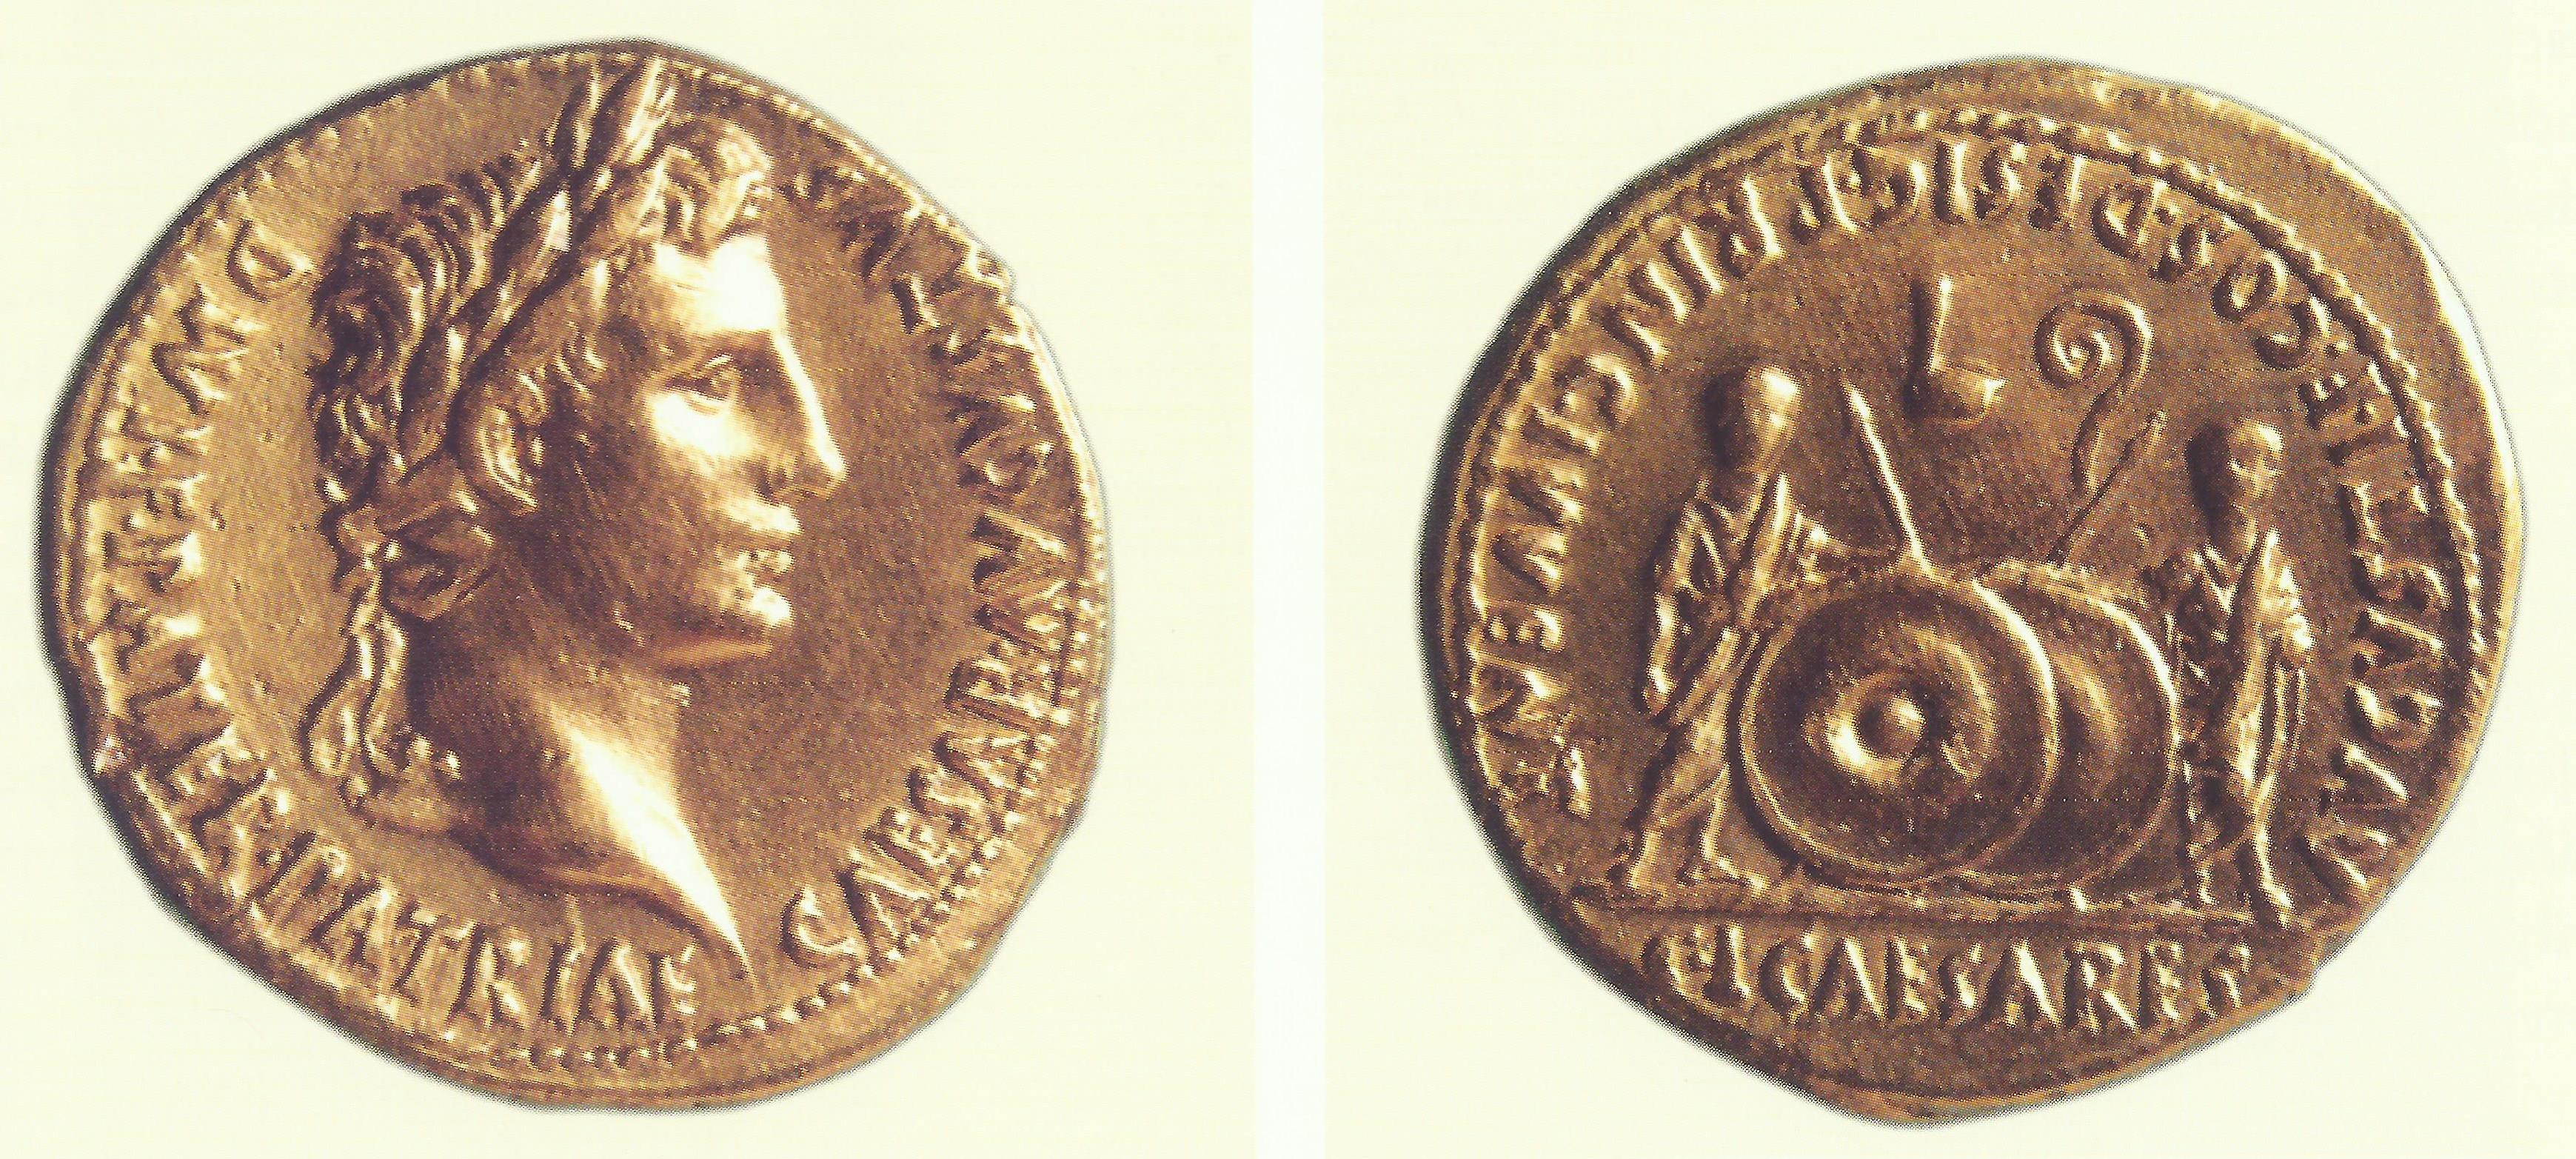 Minca (aureus) cisára Octaviana Augusta, 2 pred n. l. – 4 n. l., Bratislava-Devín